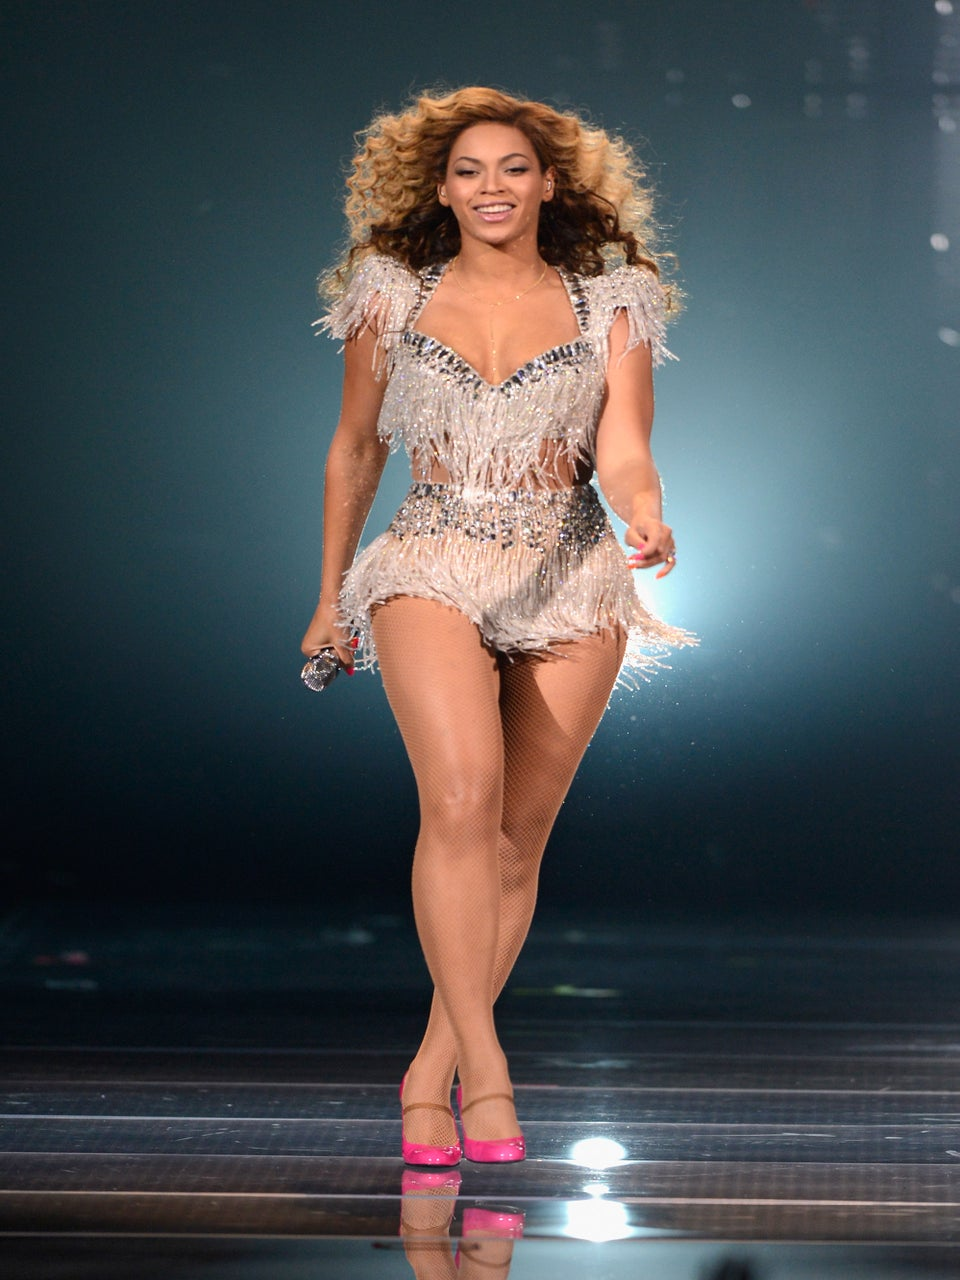 Beyoncé Gets Back to Business at Atlantic City's Revel